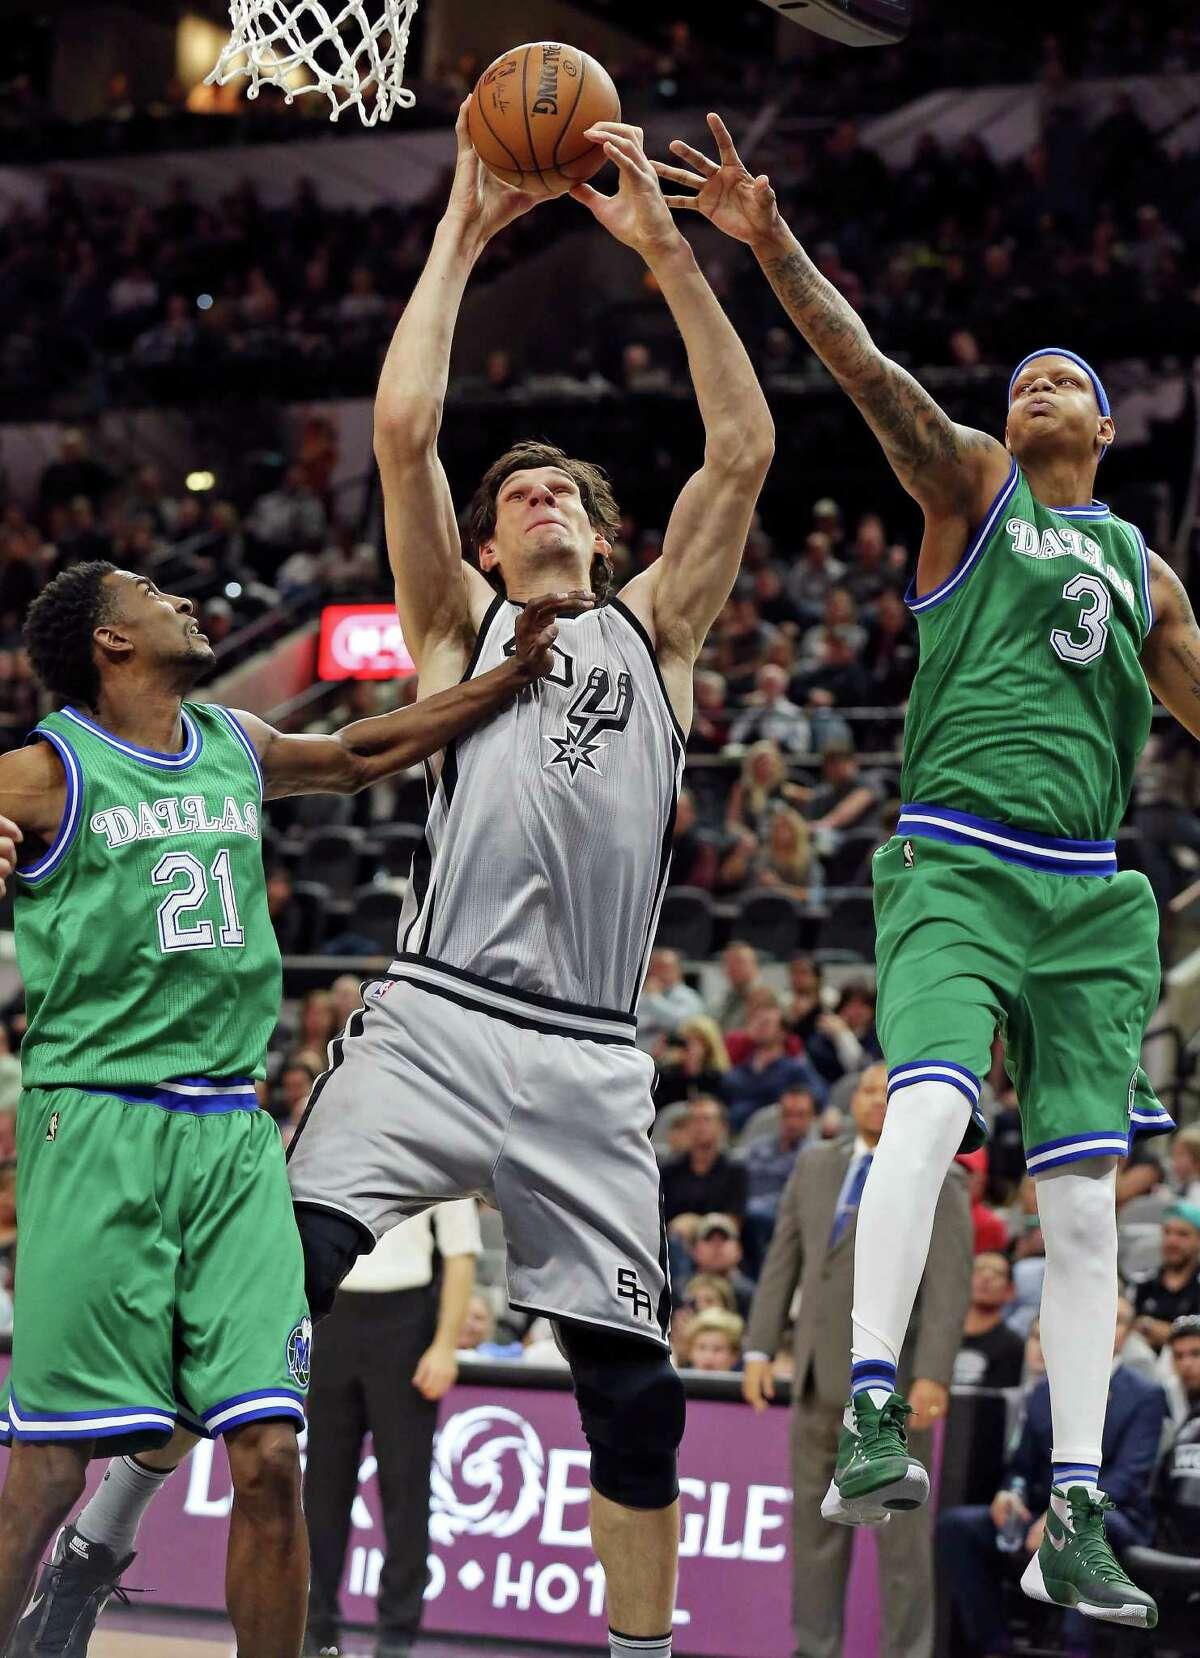 San Antonio Spurs' Boban Marjanovic grabs for a rebound between Dallas Mavericks' Jeremy Evans (left) and Charlie Villanueva during second half action Sunday Jan. 17, 2016 at the AT&T Center. The Spurs won 112-83.